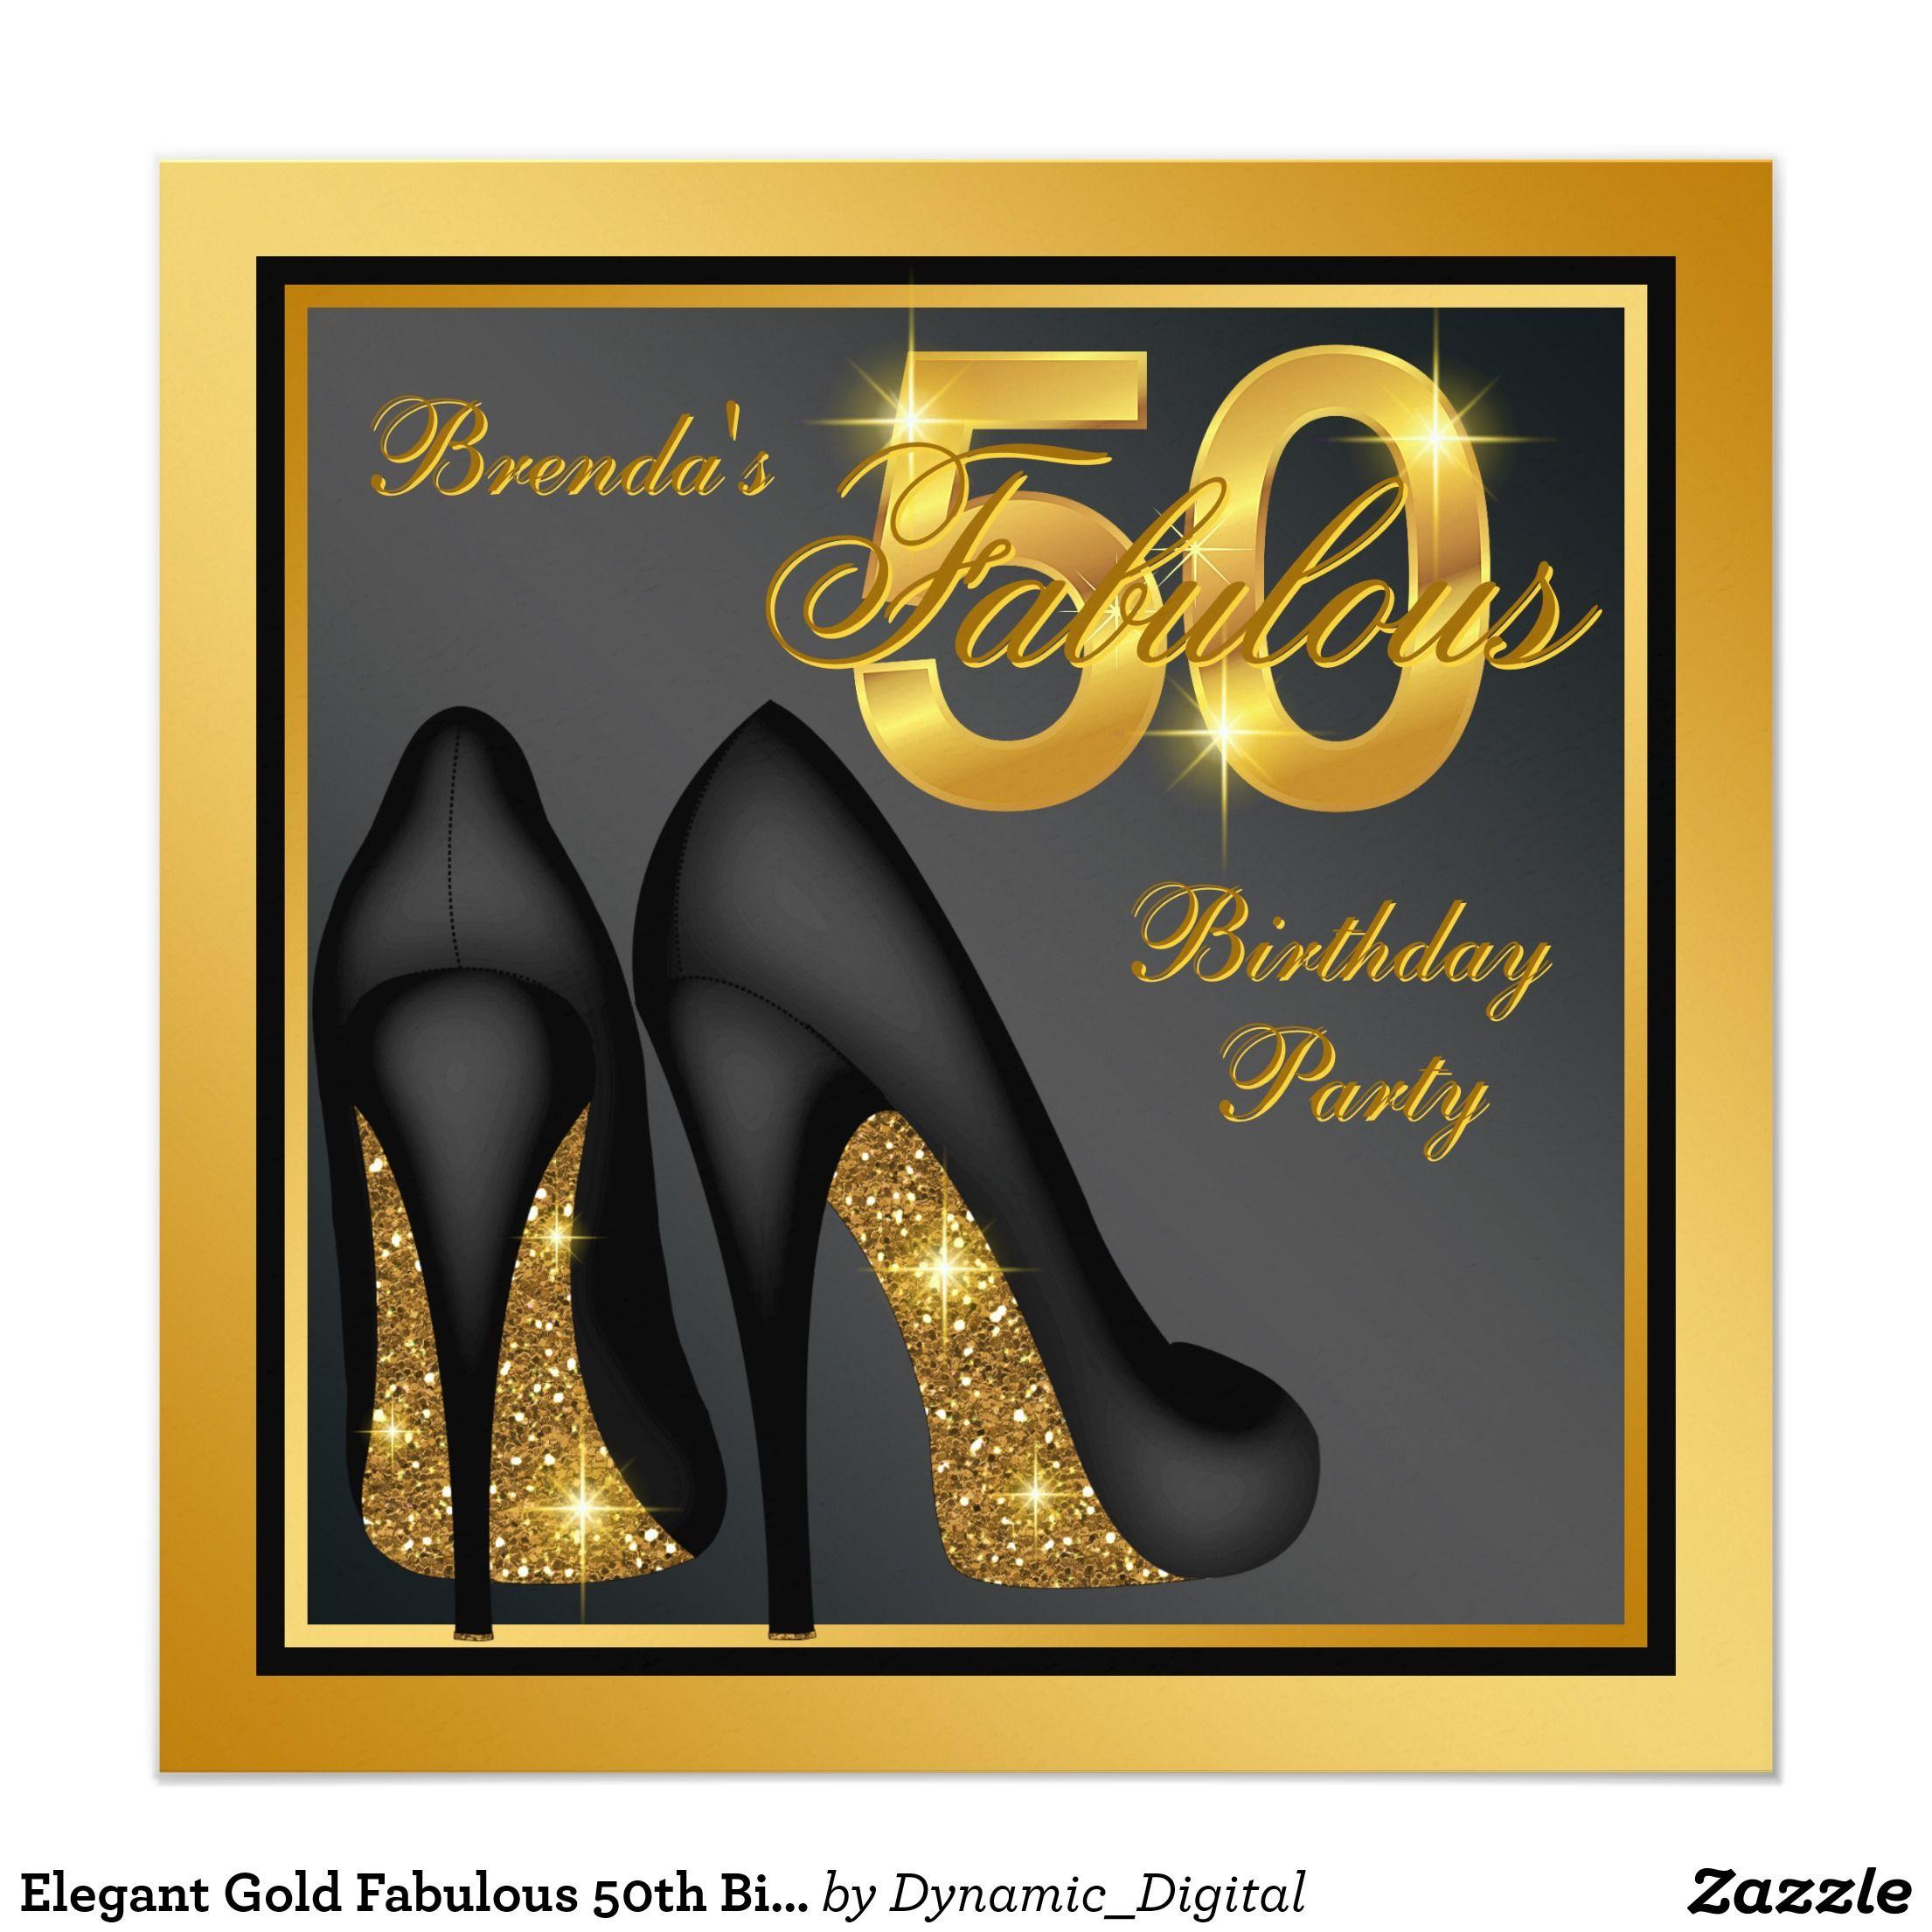 Scenario of the womans 55th birthday